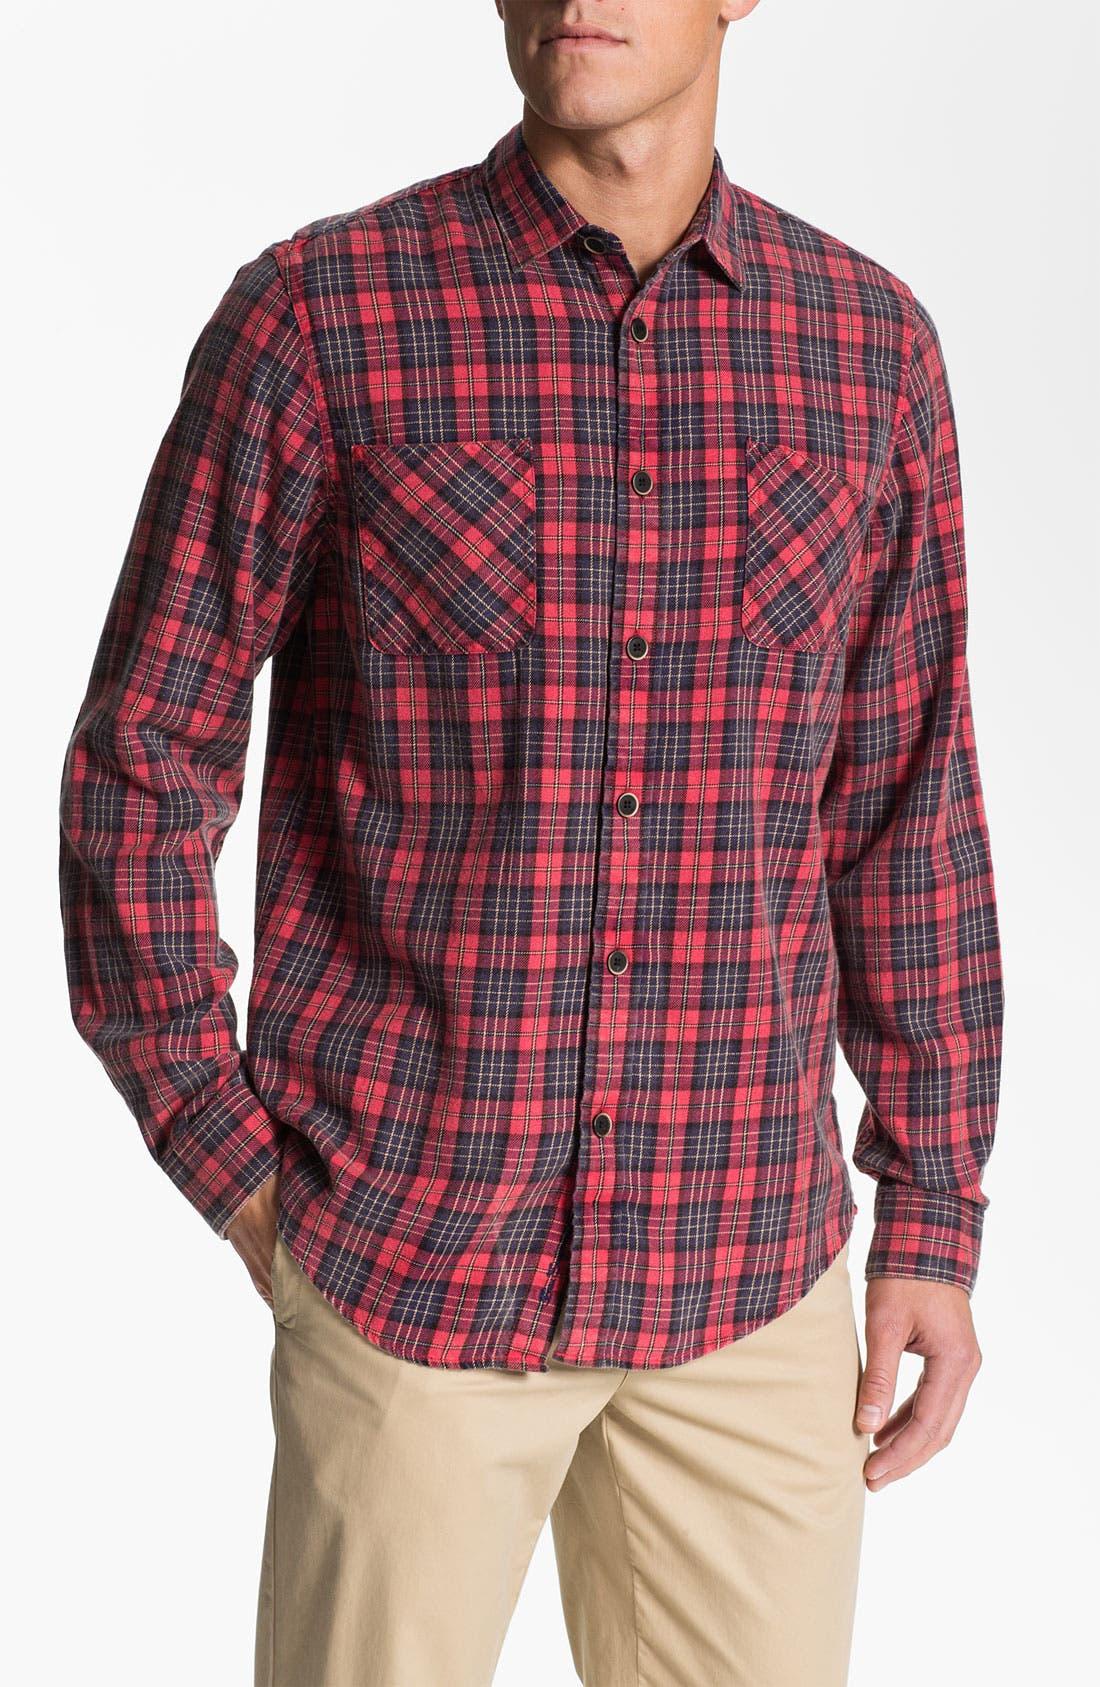 Main Image - Ben Sherman 'Shoreditch' Plaid Twill Shirt